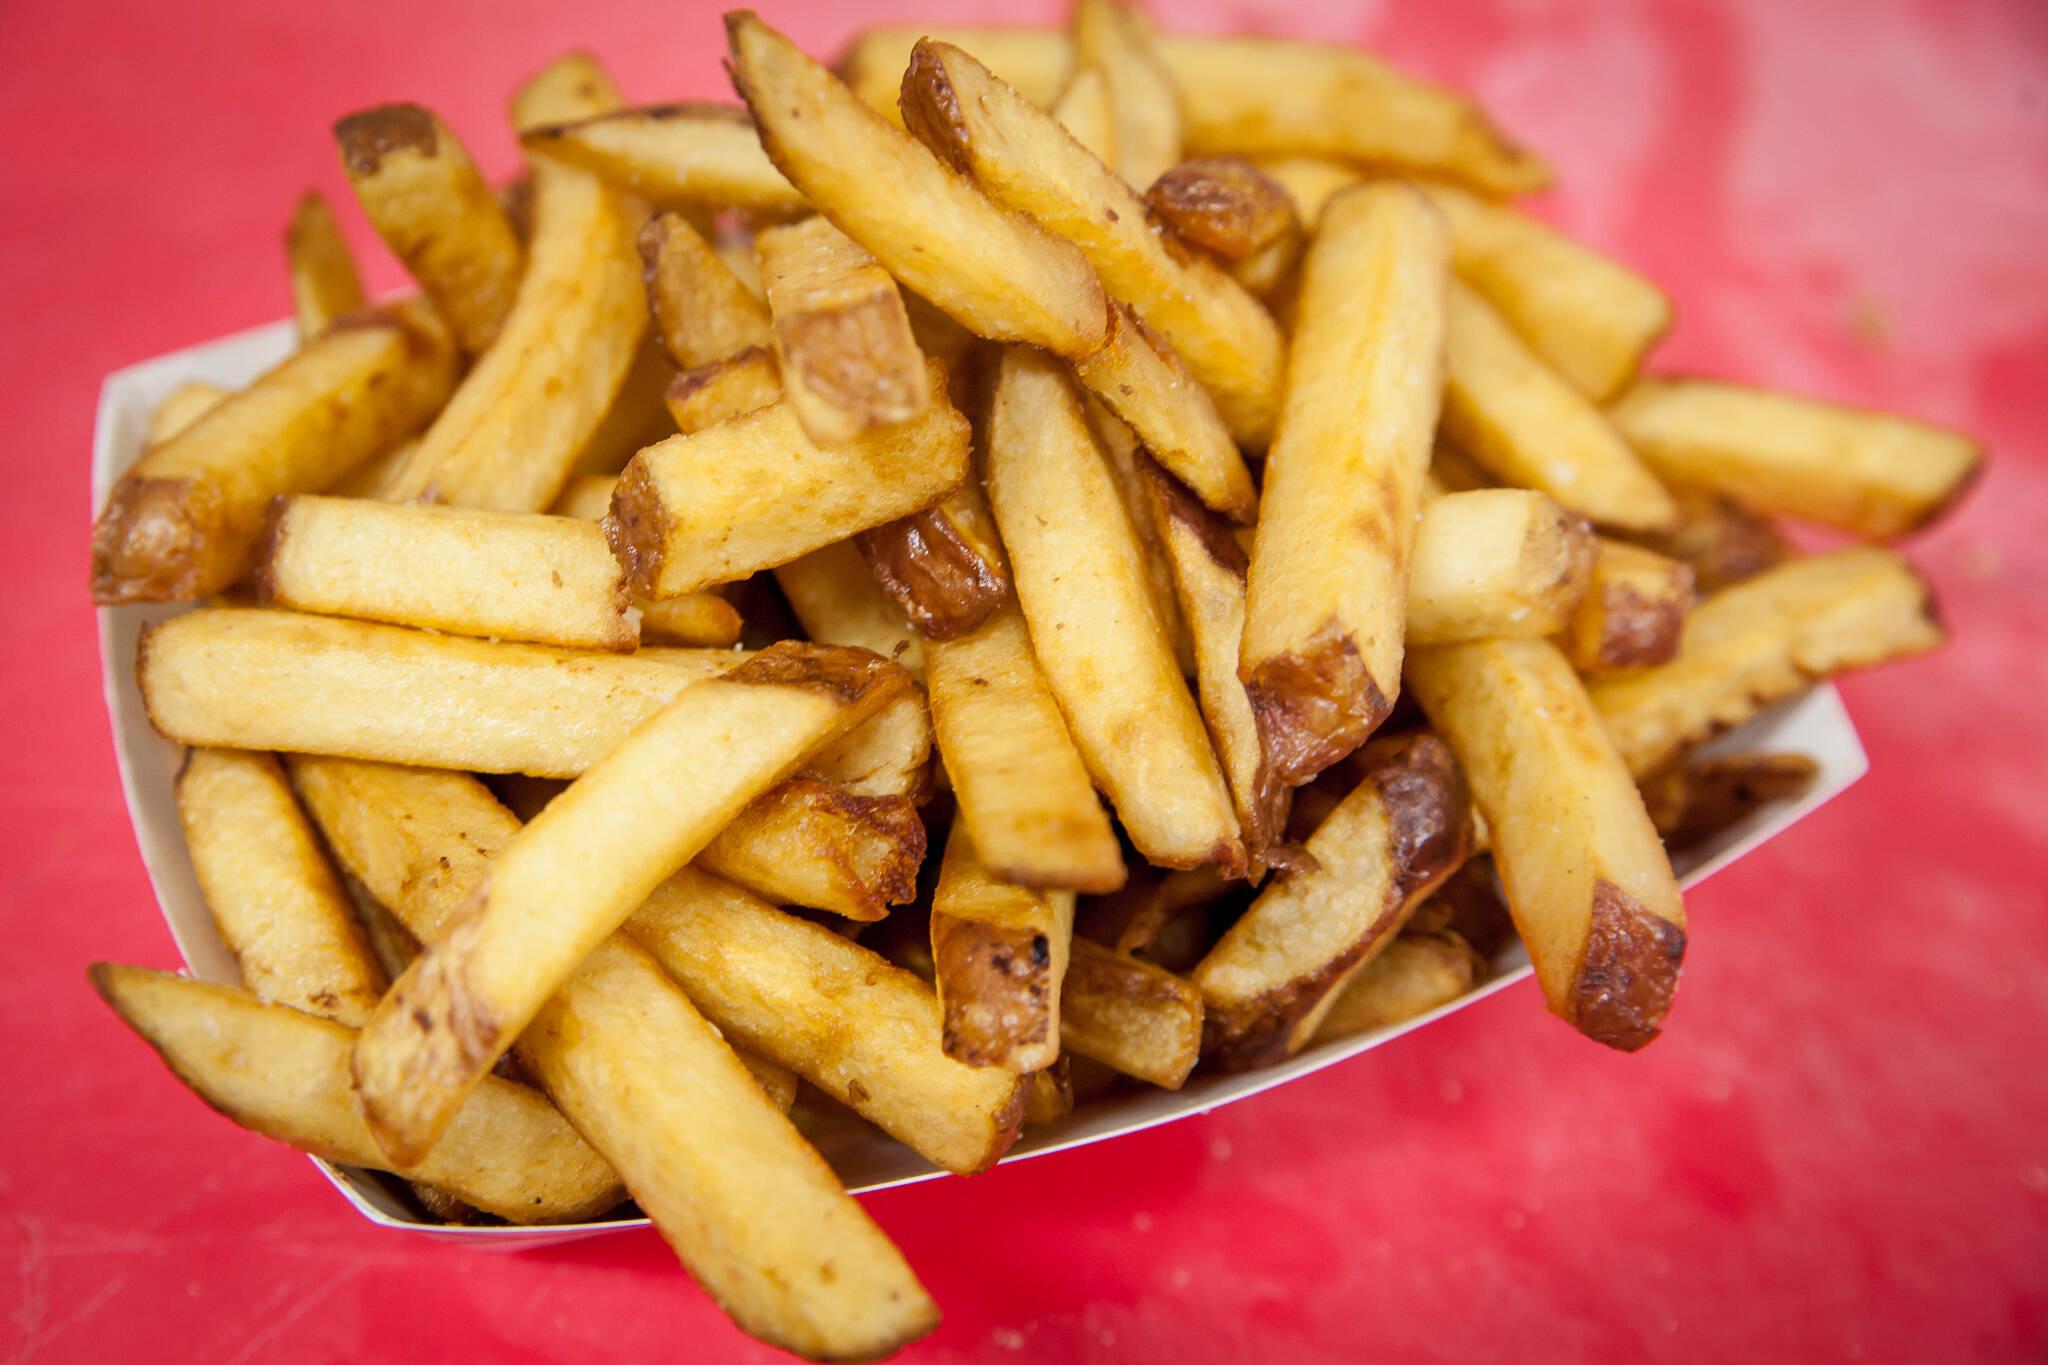 canada potato supply